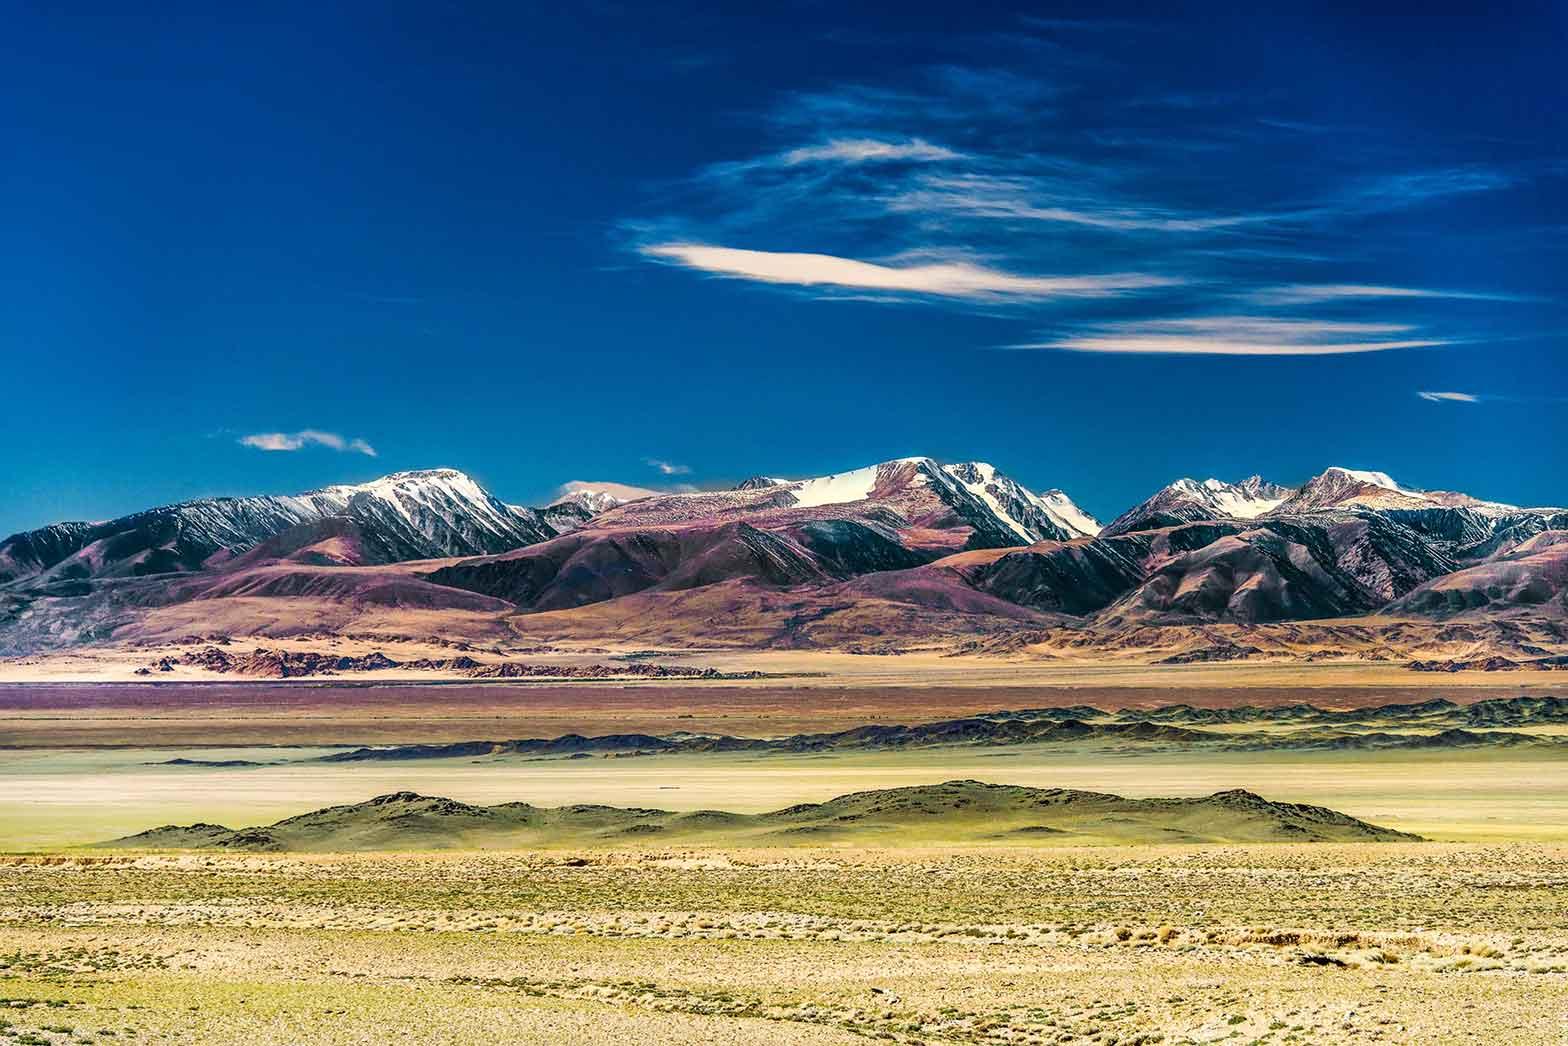 Northwestern Mongolia